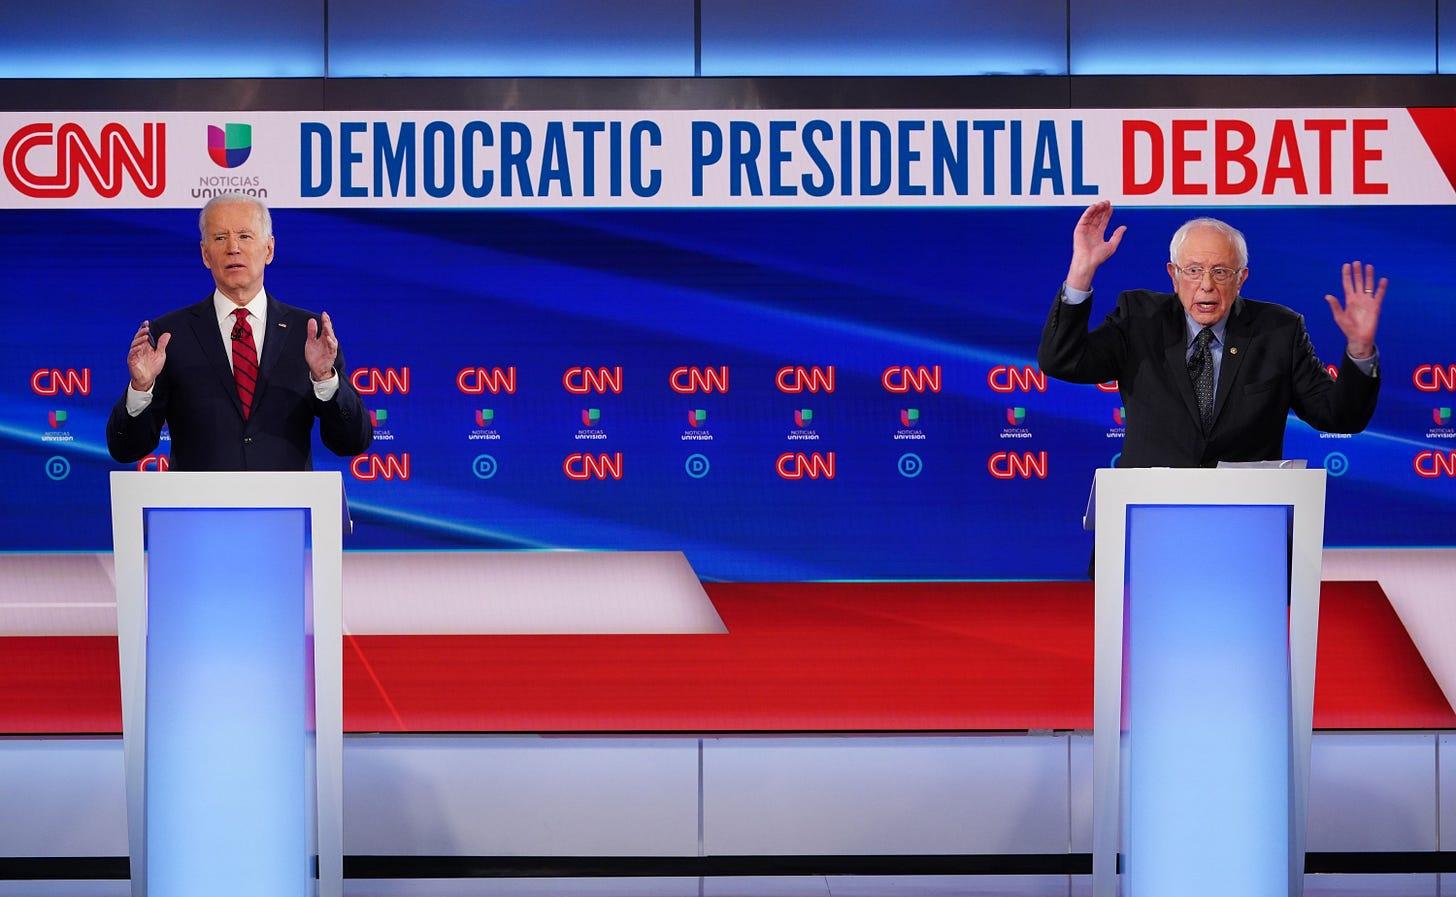 Biden stands next to Sanders at Democratic Presidential Debate